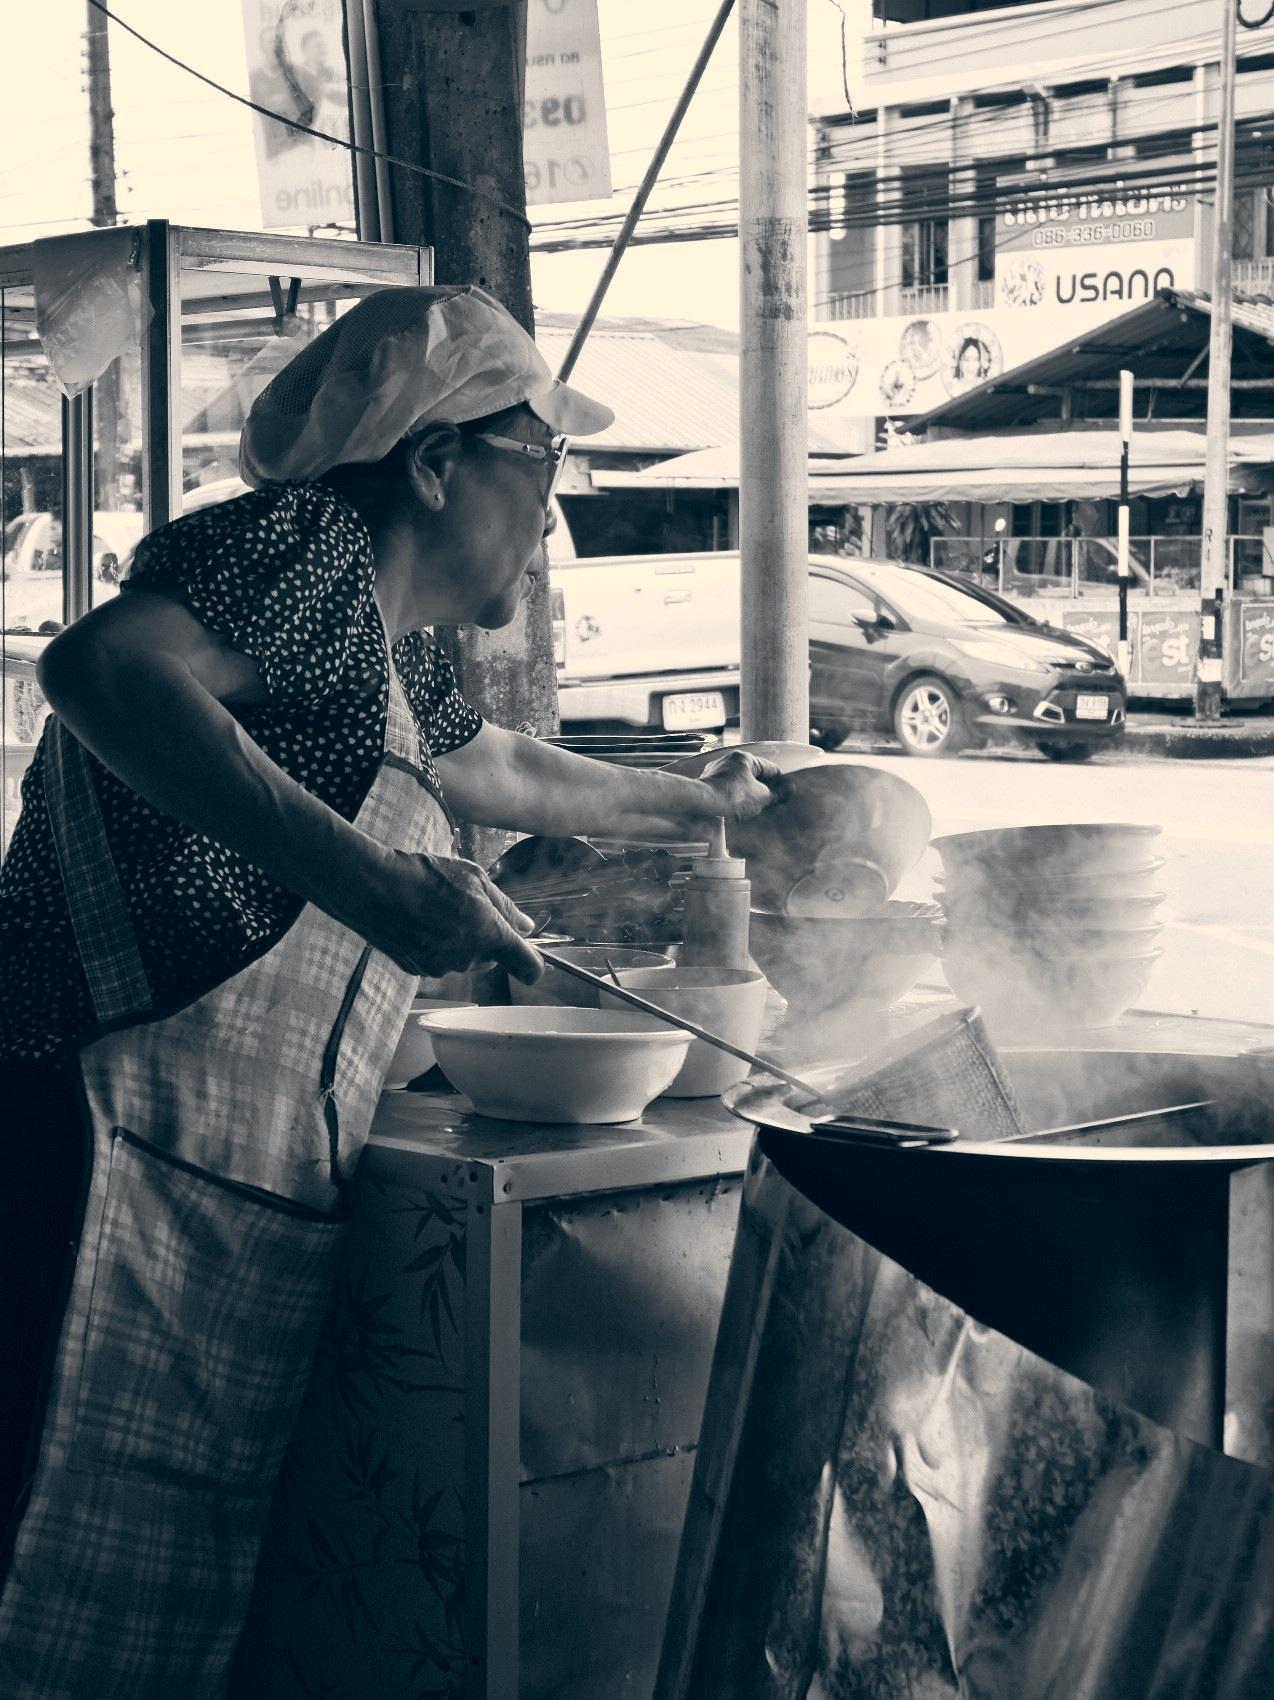 Superstar street food vendor again by TonyG